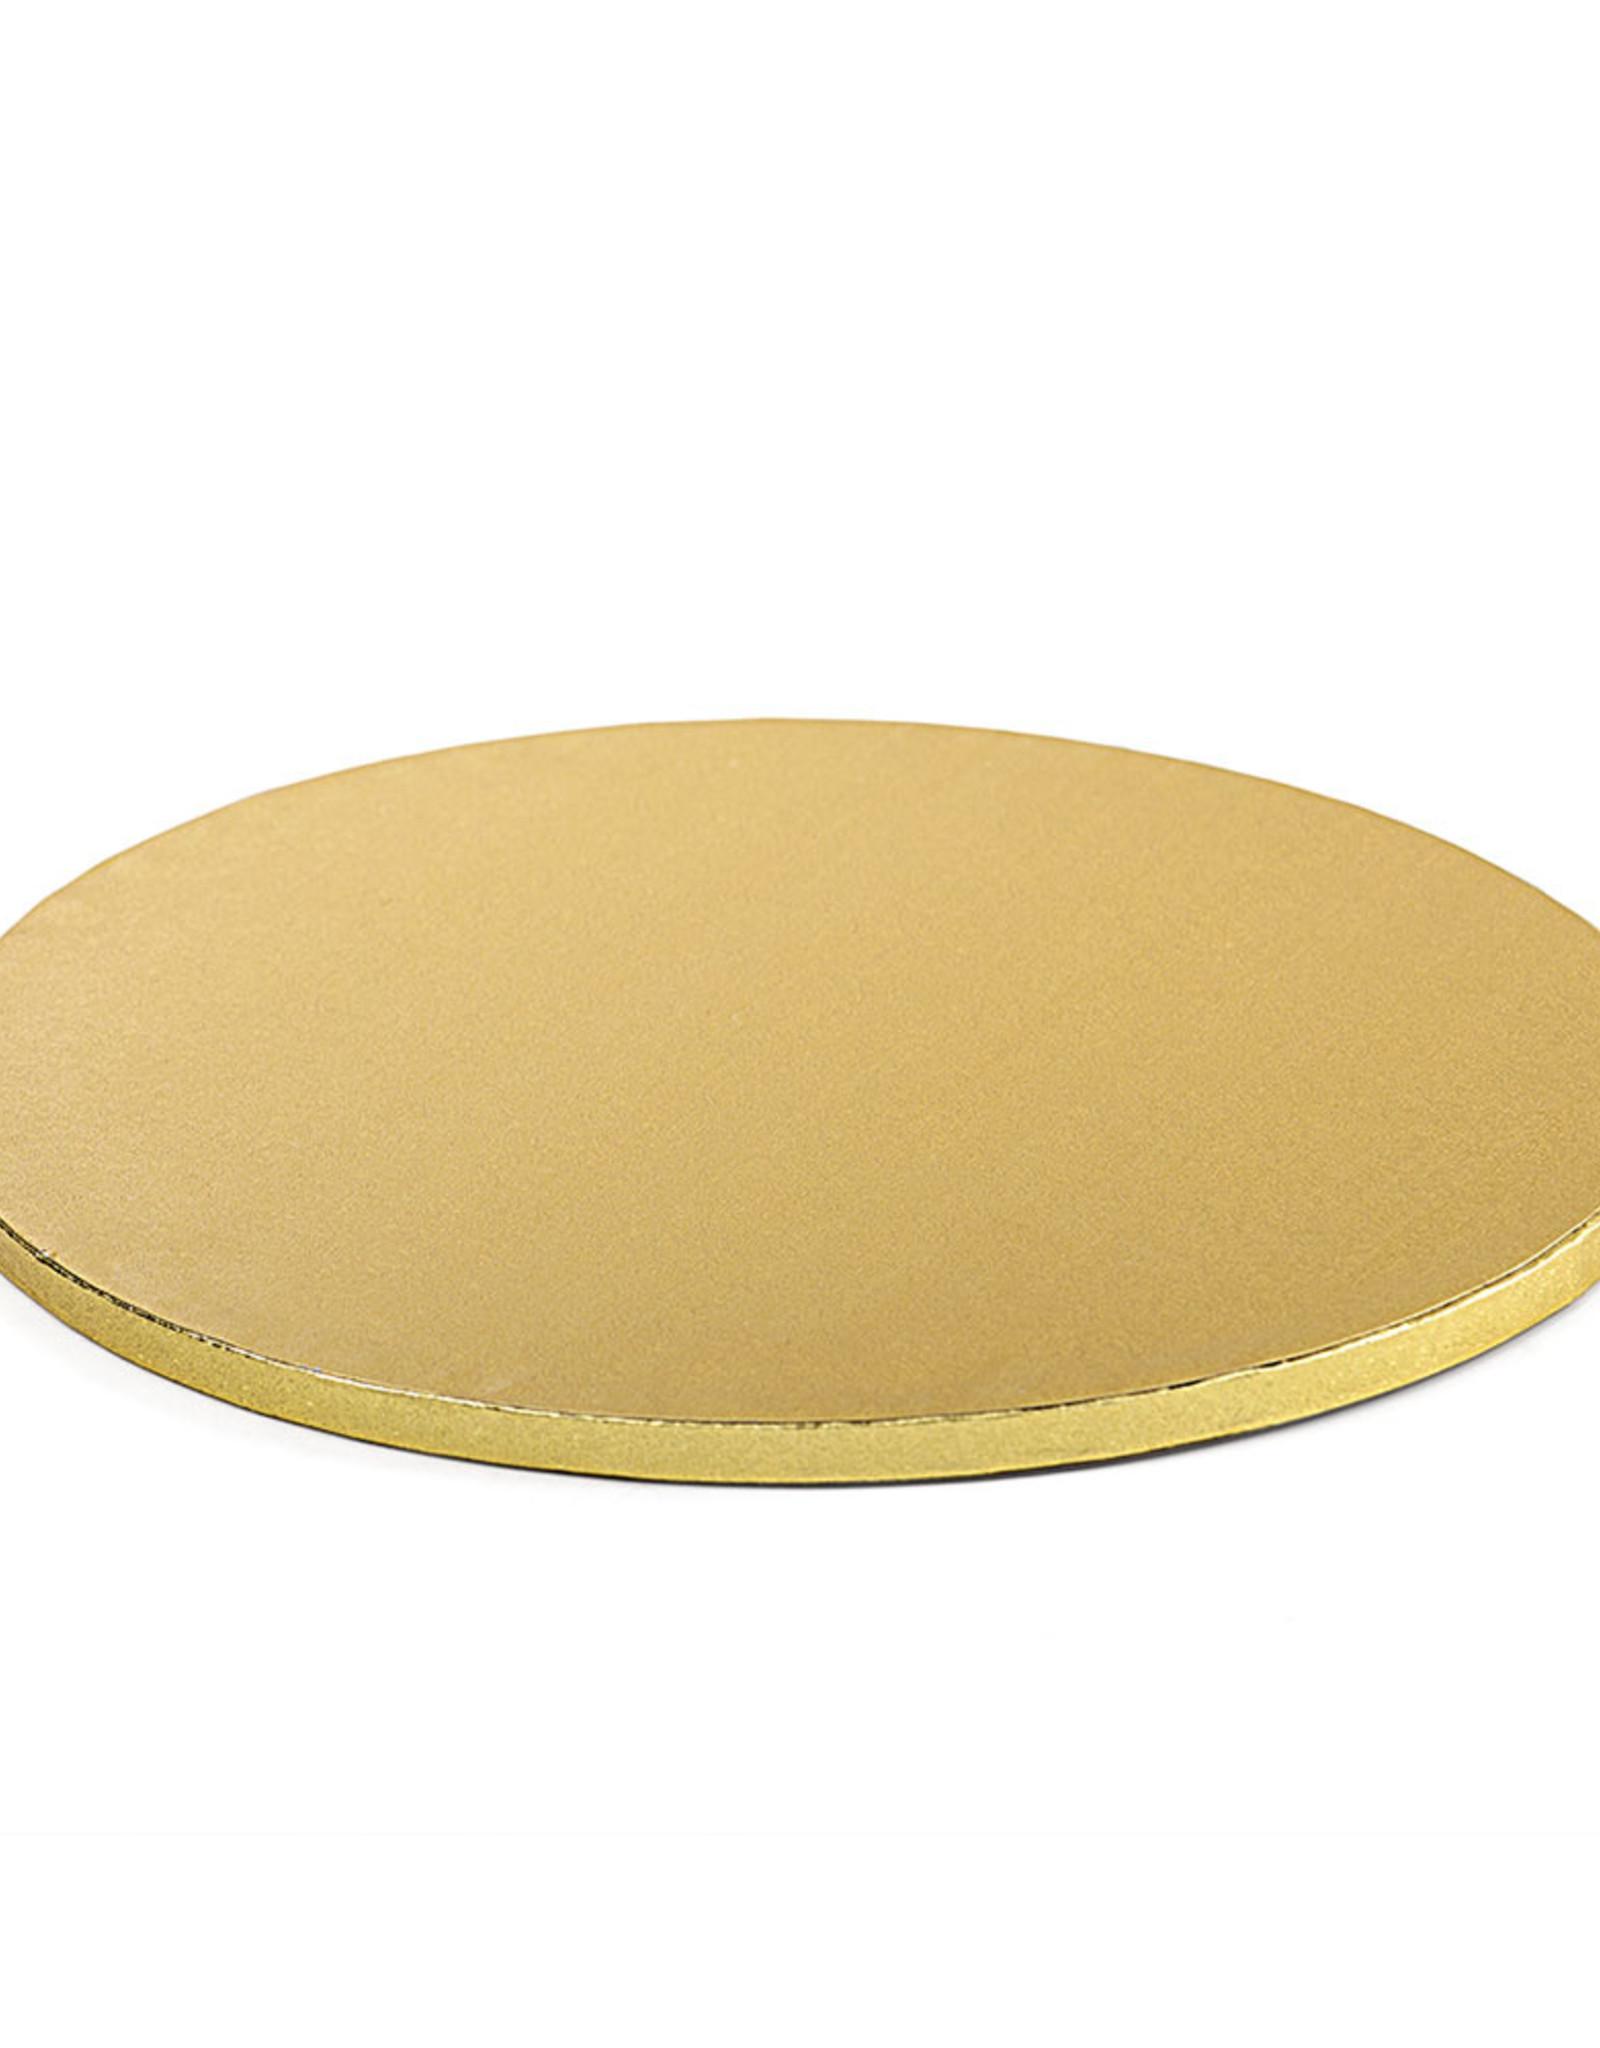 Decora Cake Drum Rond Ø50cm Gold